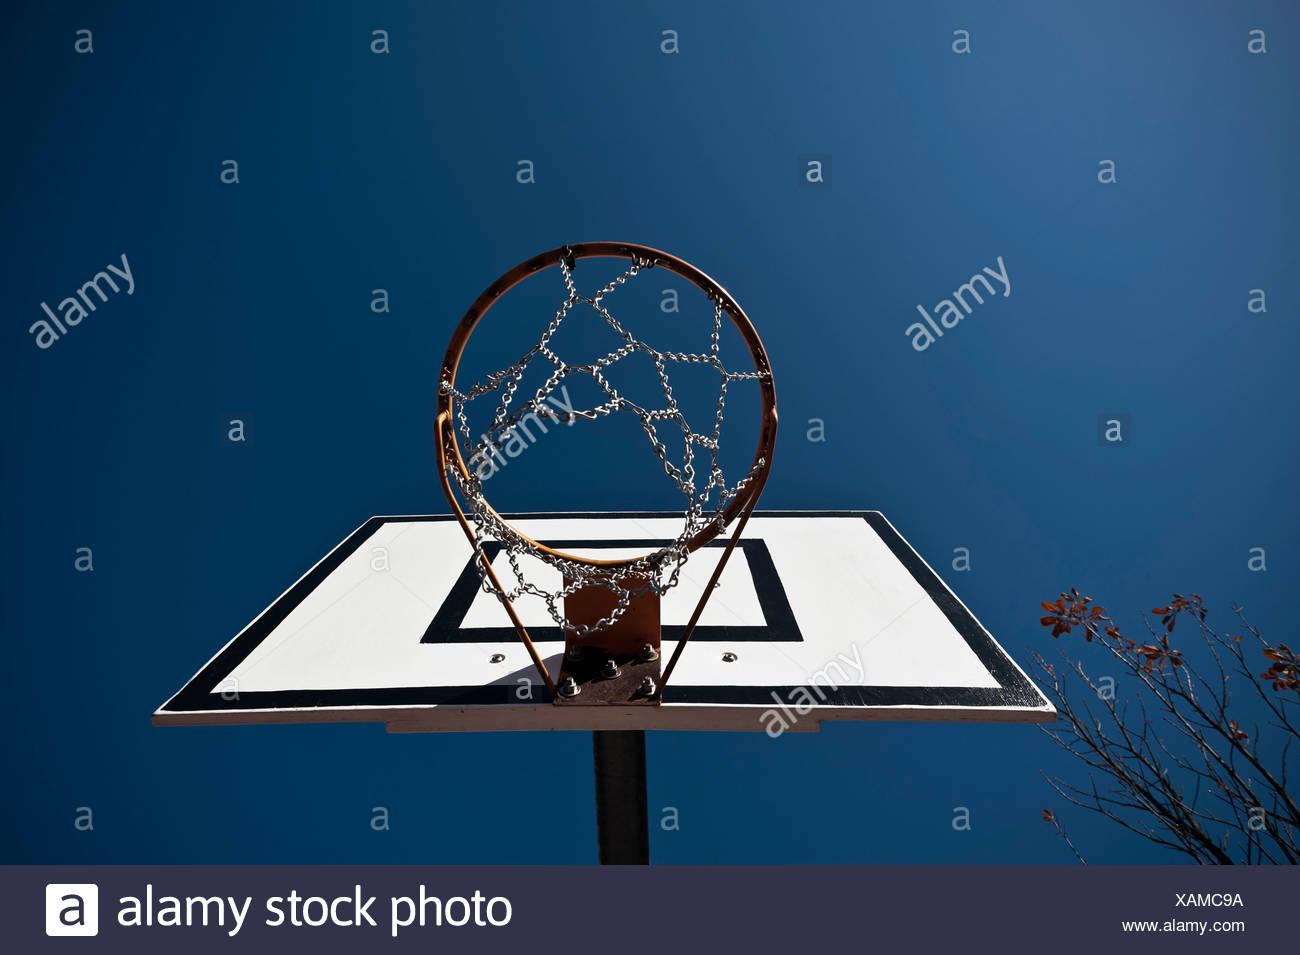 Germany, North Rhine-Westphalia, Düsseldorf, Empty basketball hoop against blue sky Stock Photo